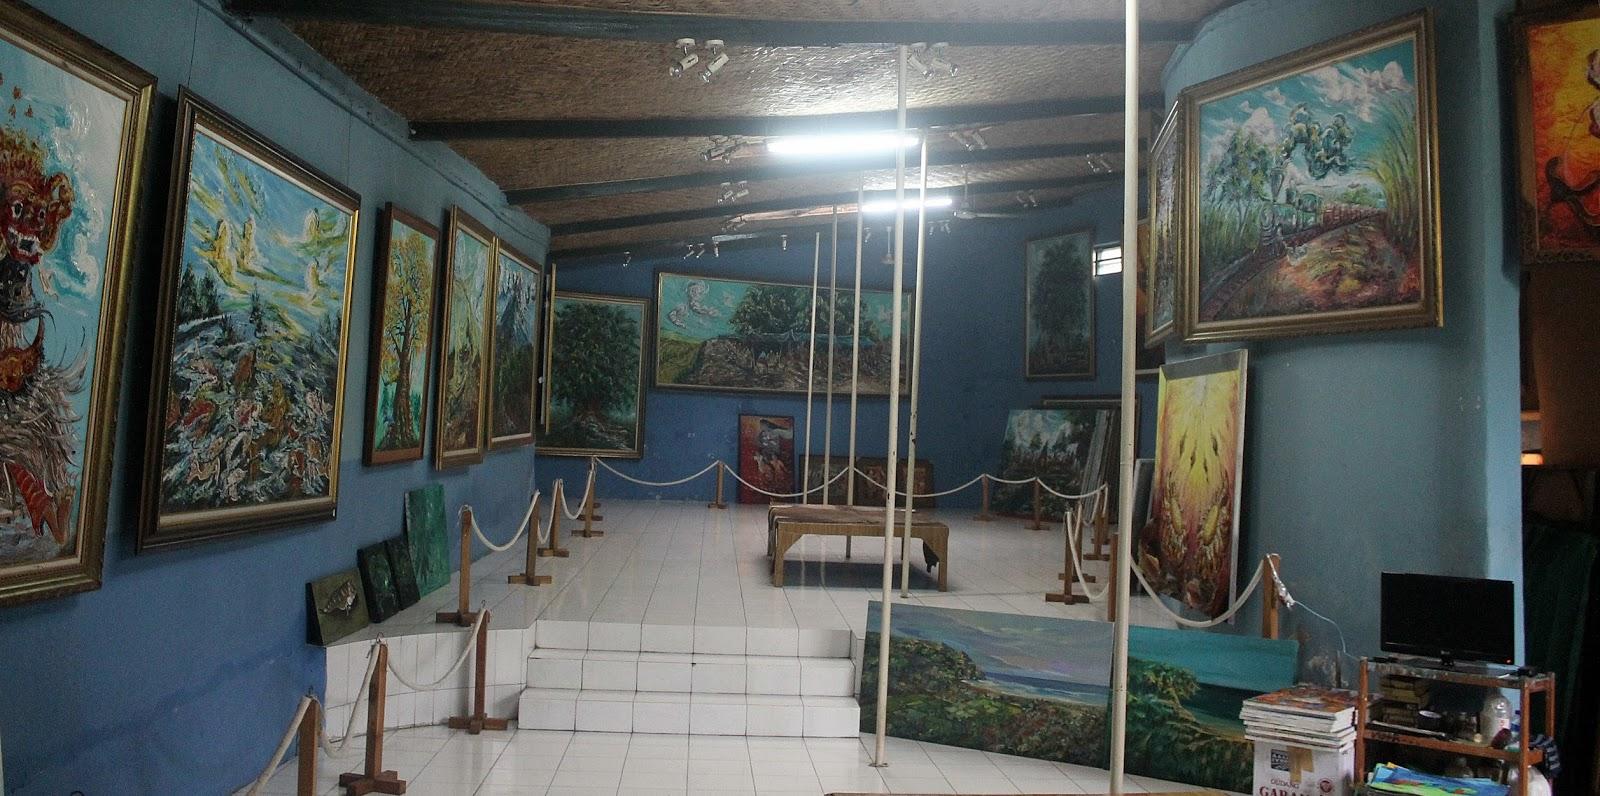 Museum Affandi - PERSONAL, TRAVEL and ART